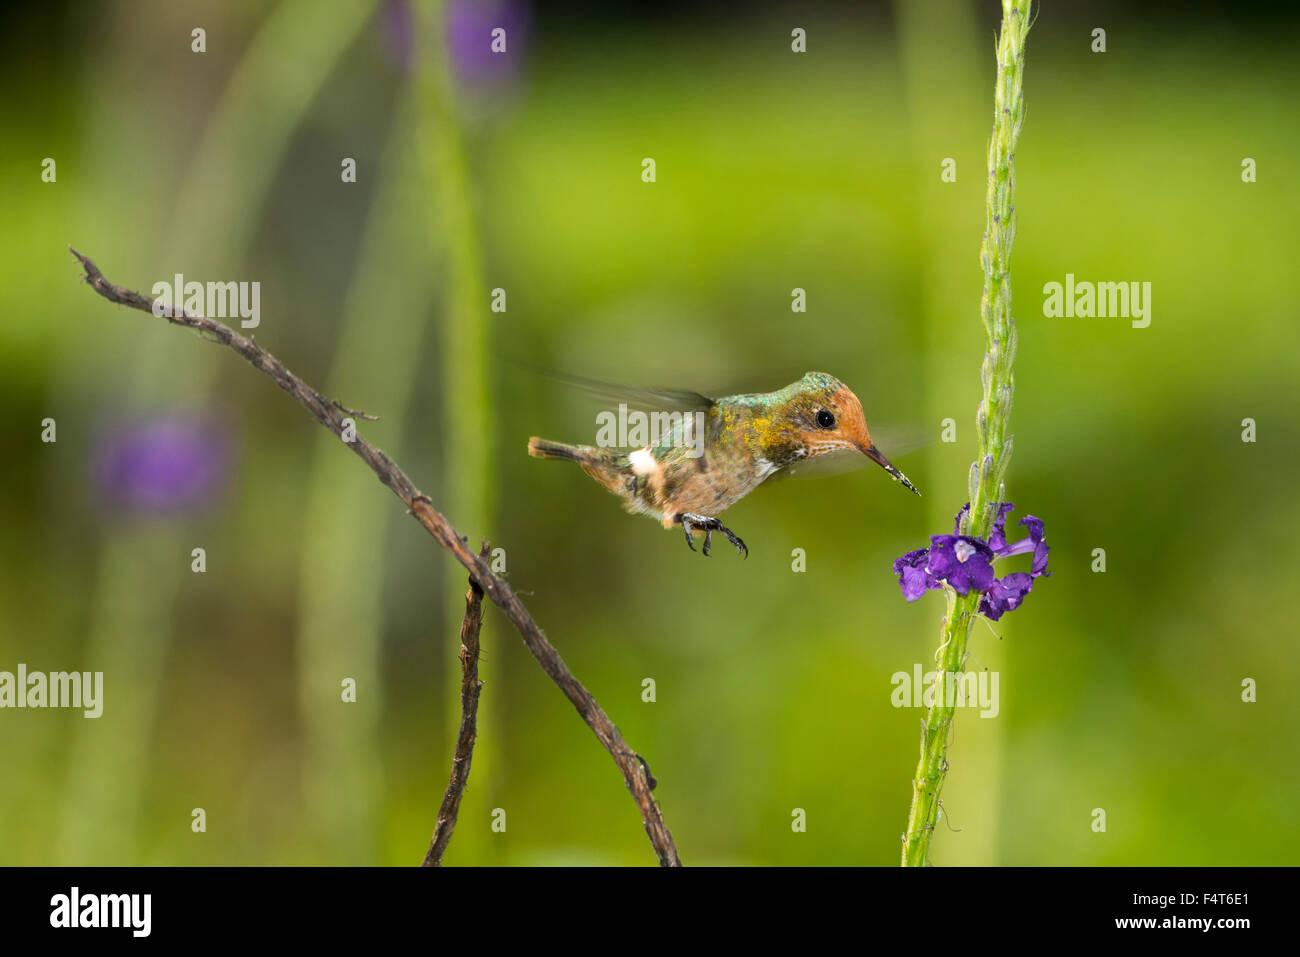 South America, Latin America, Peru, Manu National Park, Hummingbird - Stock Image